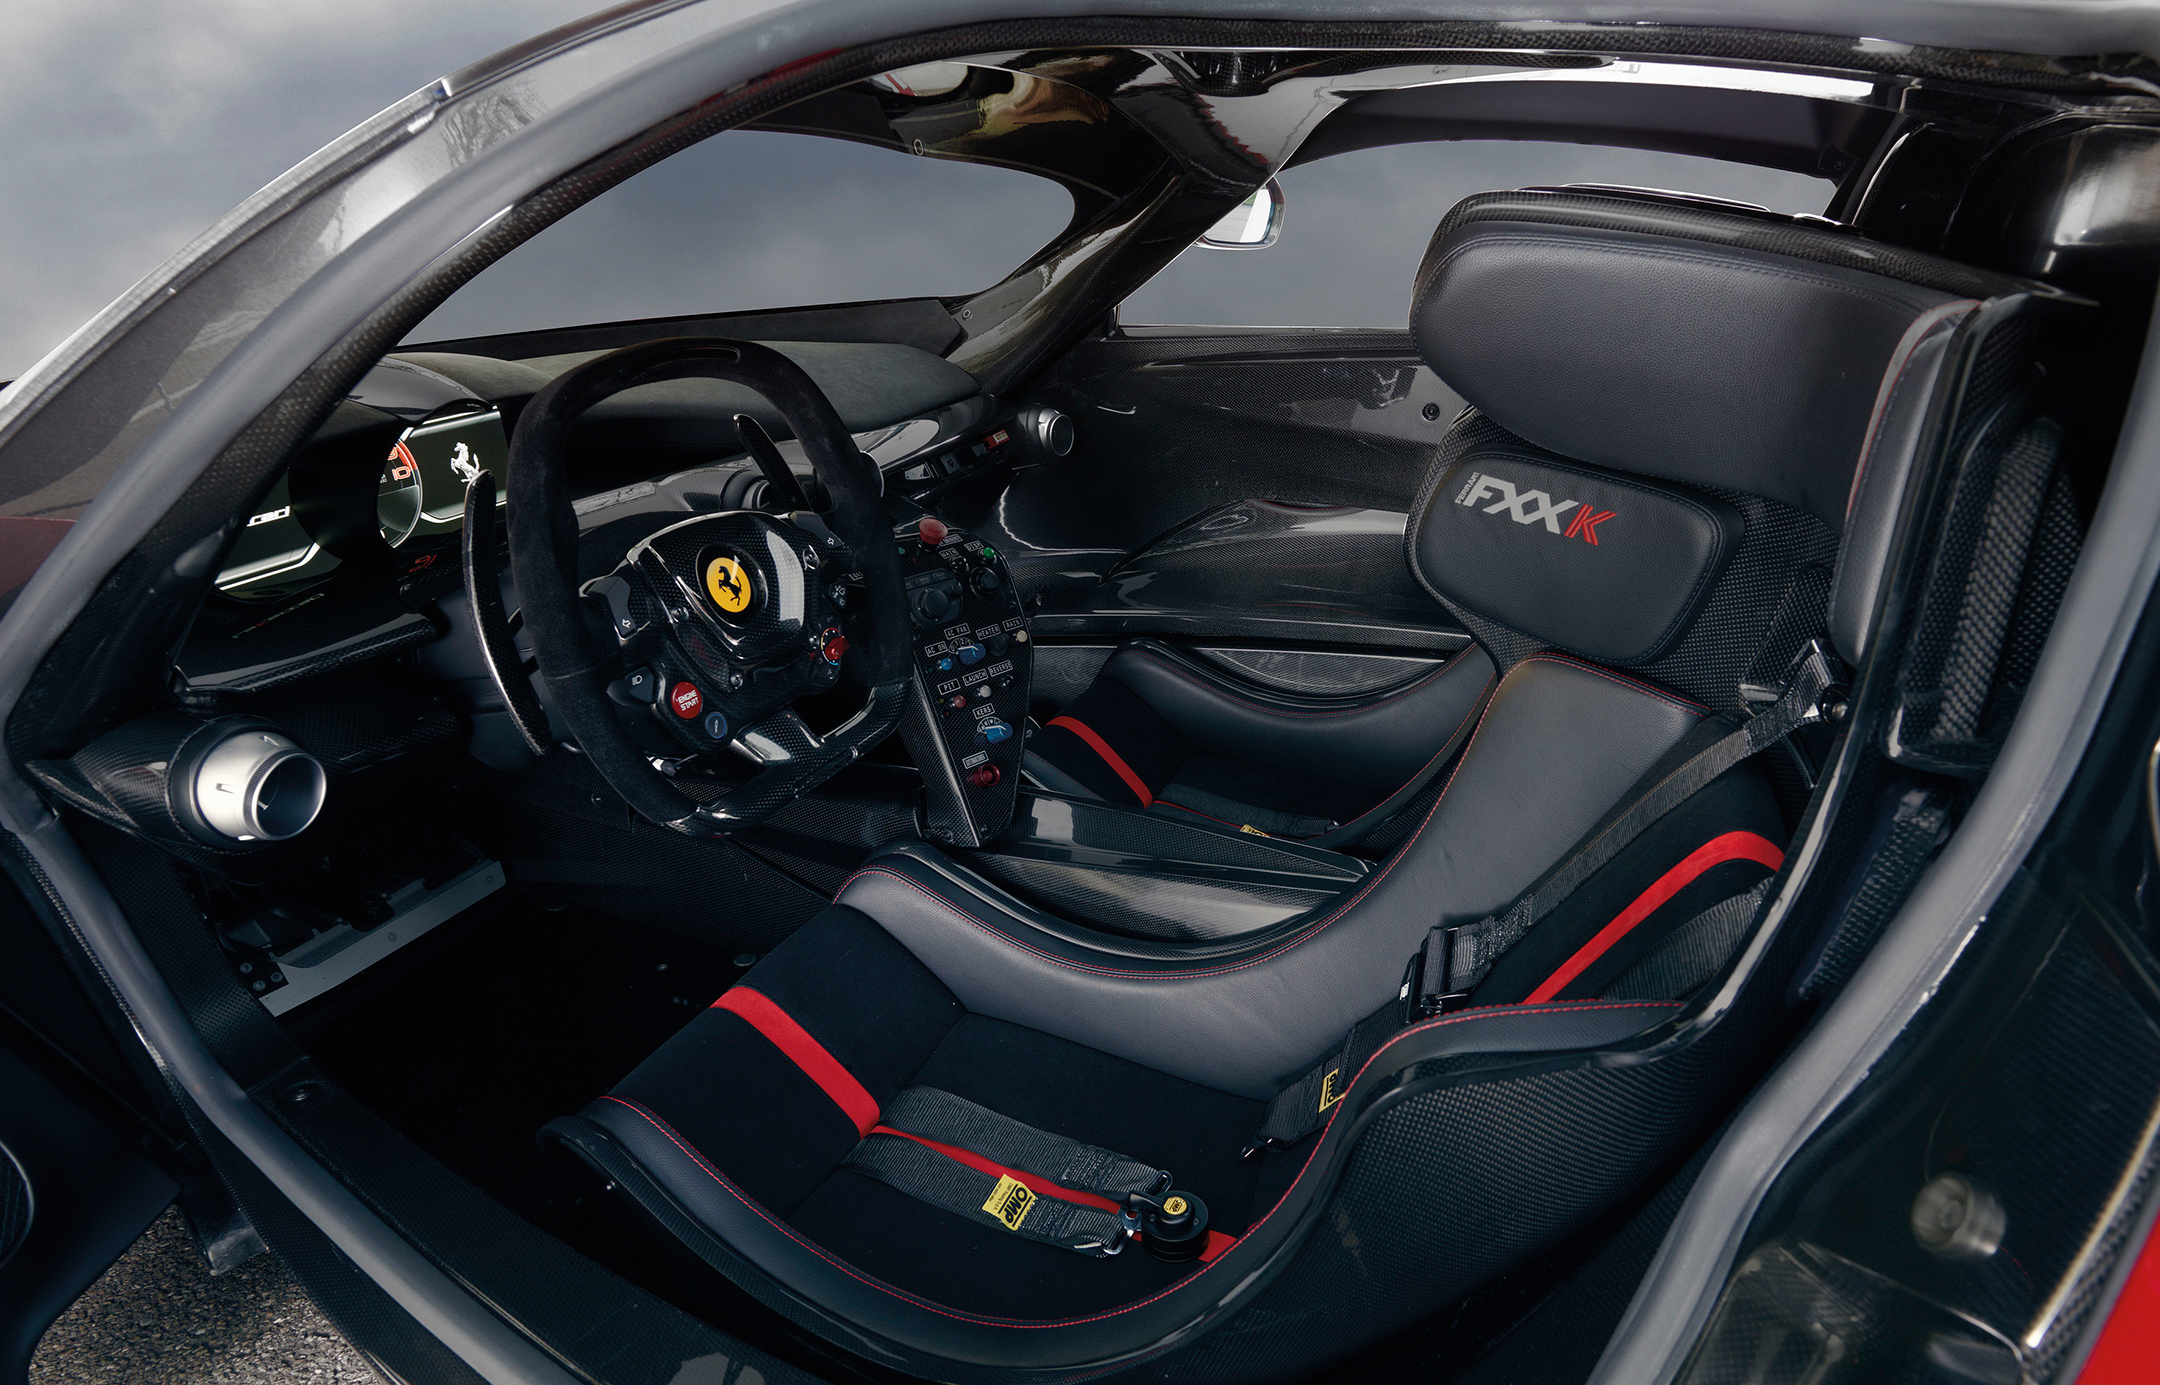 Ferrari FXX K - 2015 - interior / intérieur